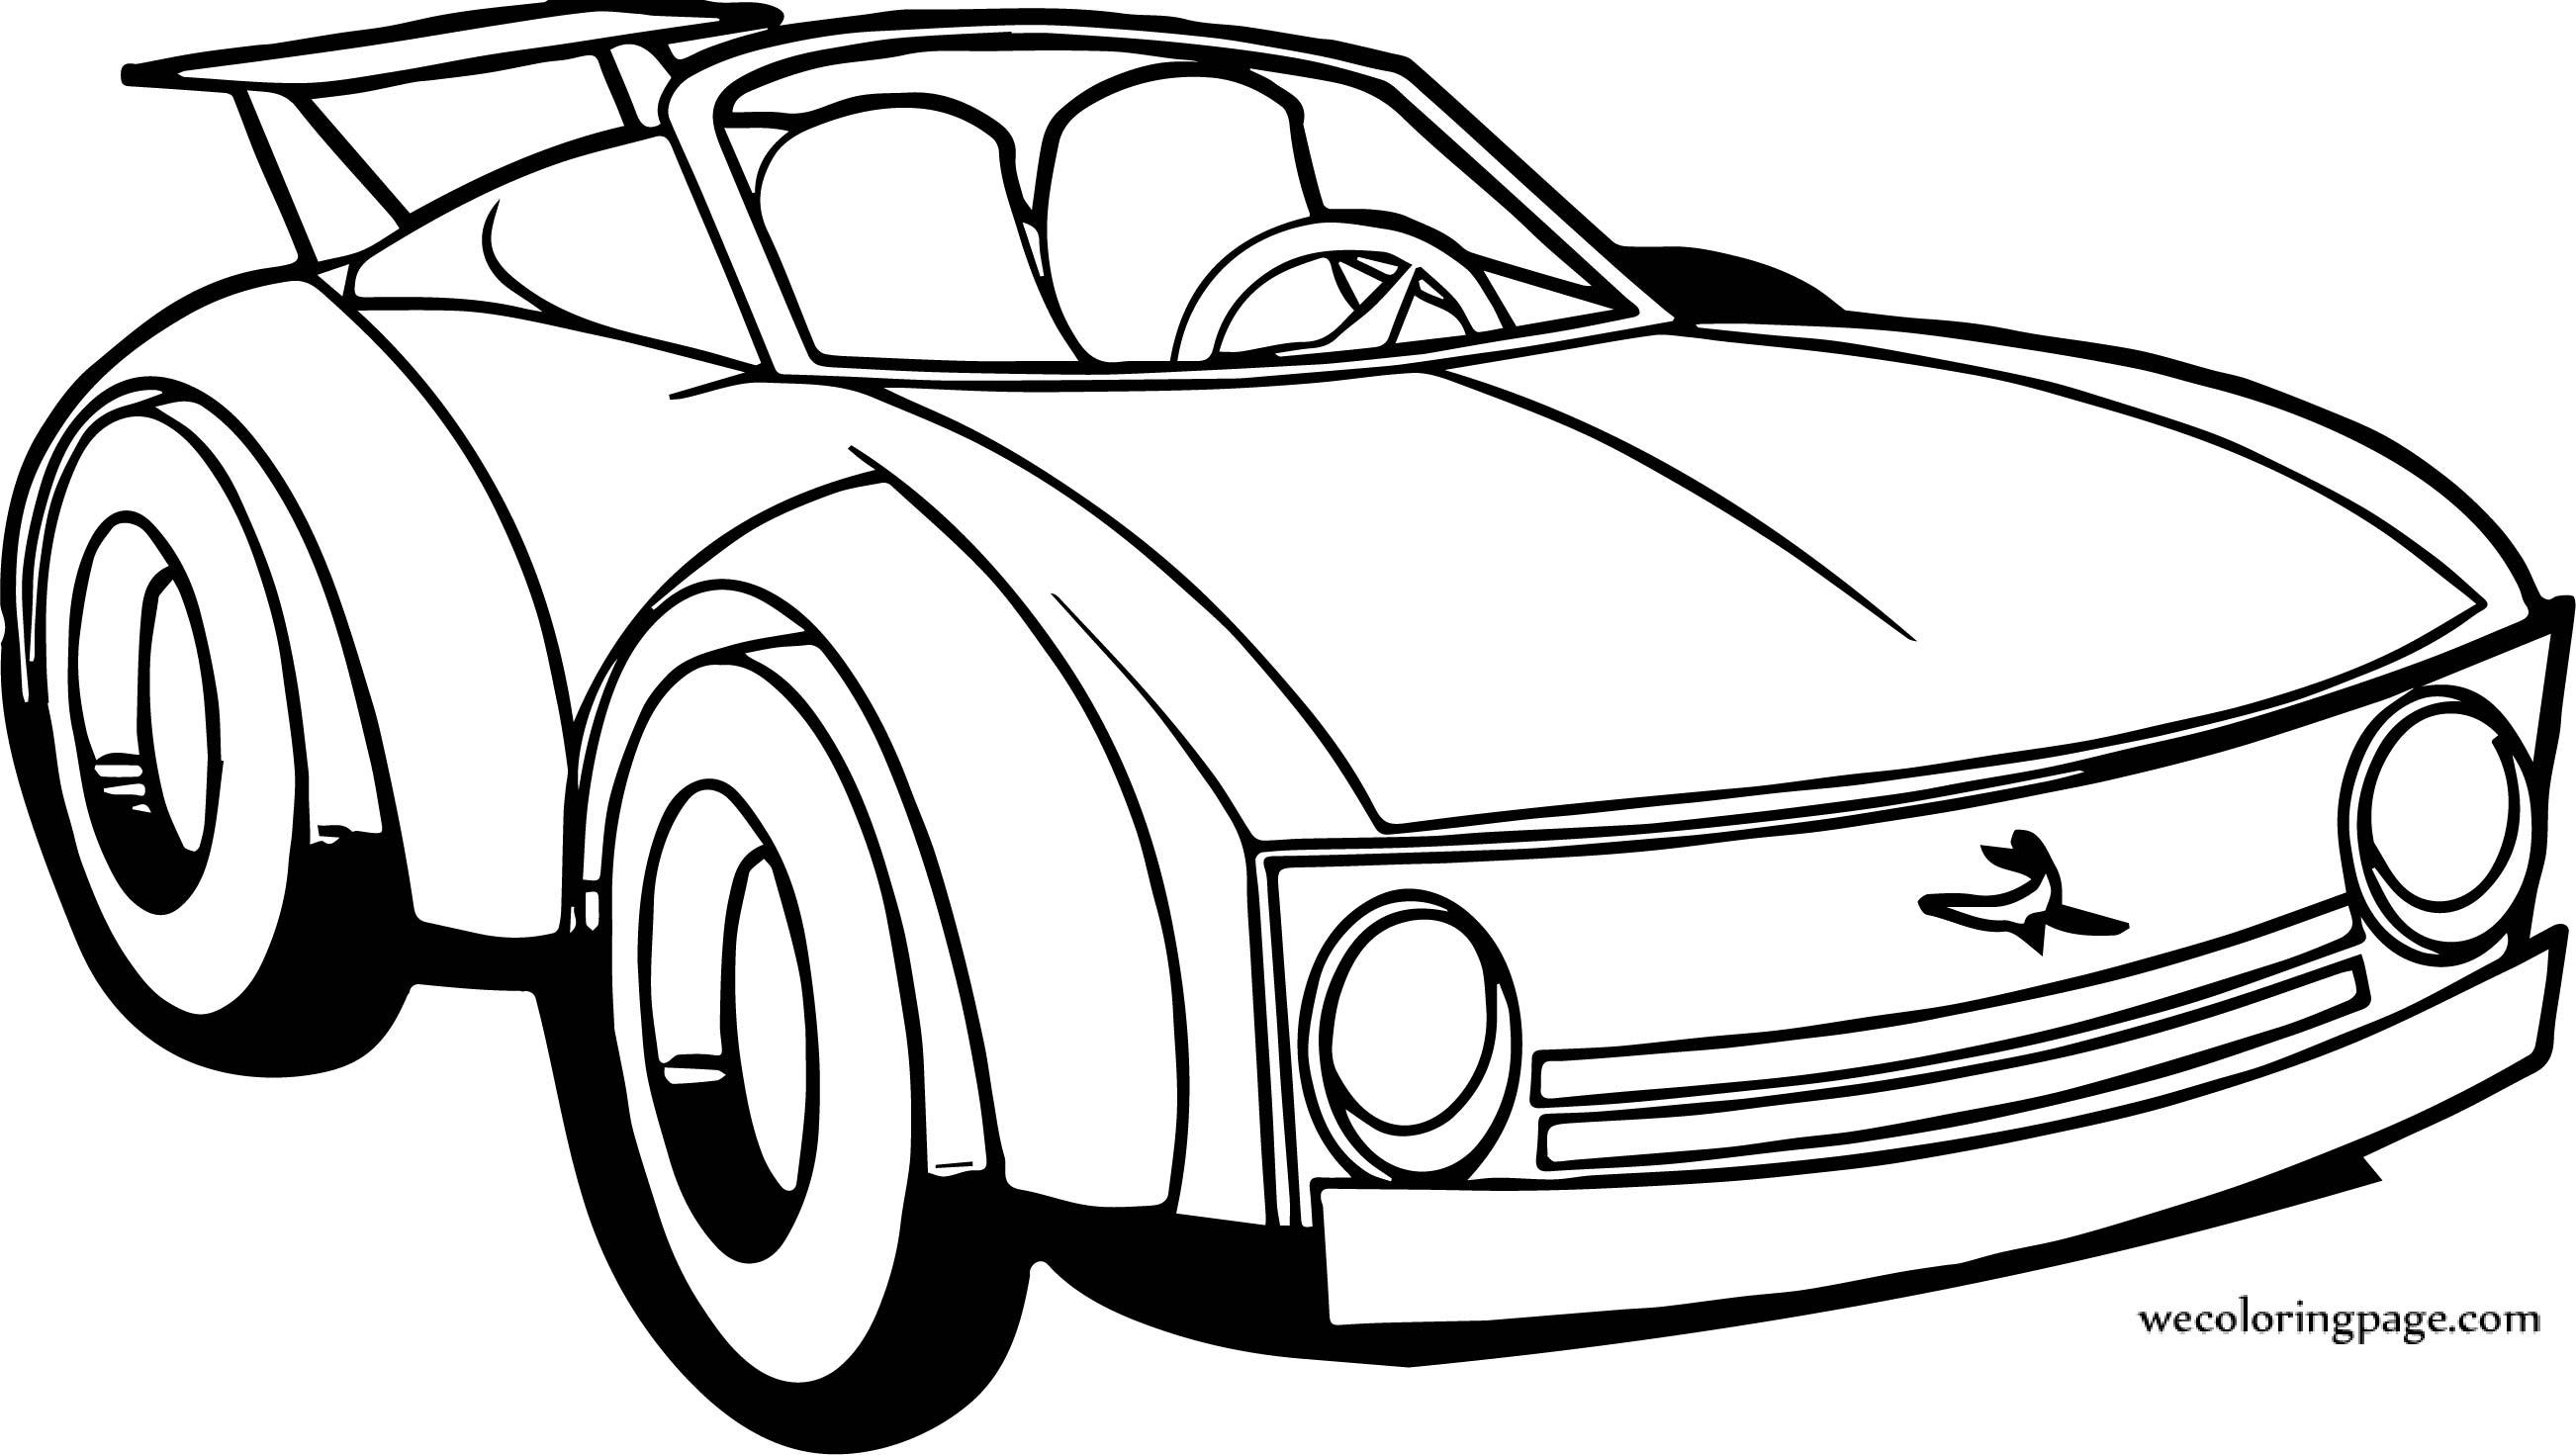 Perspective Car Cartoon Coloring Page